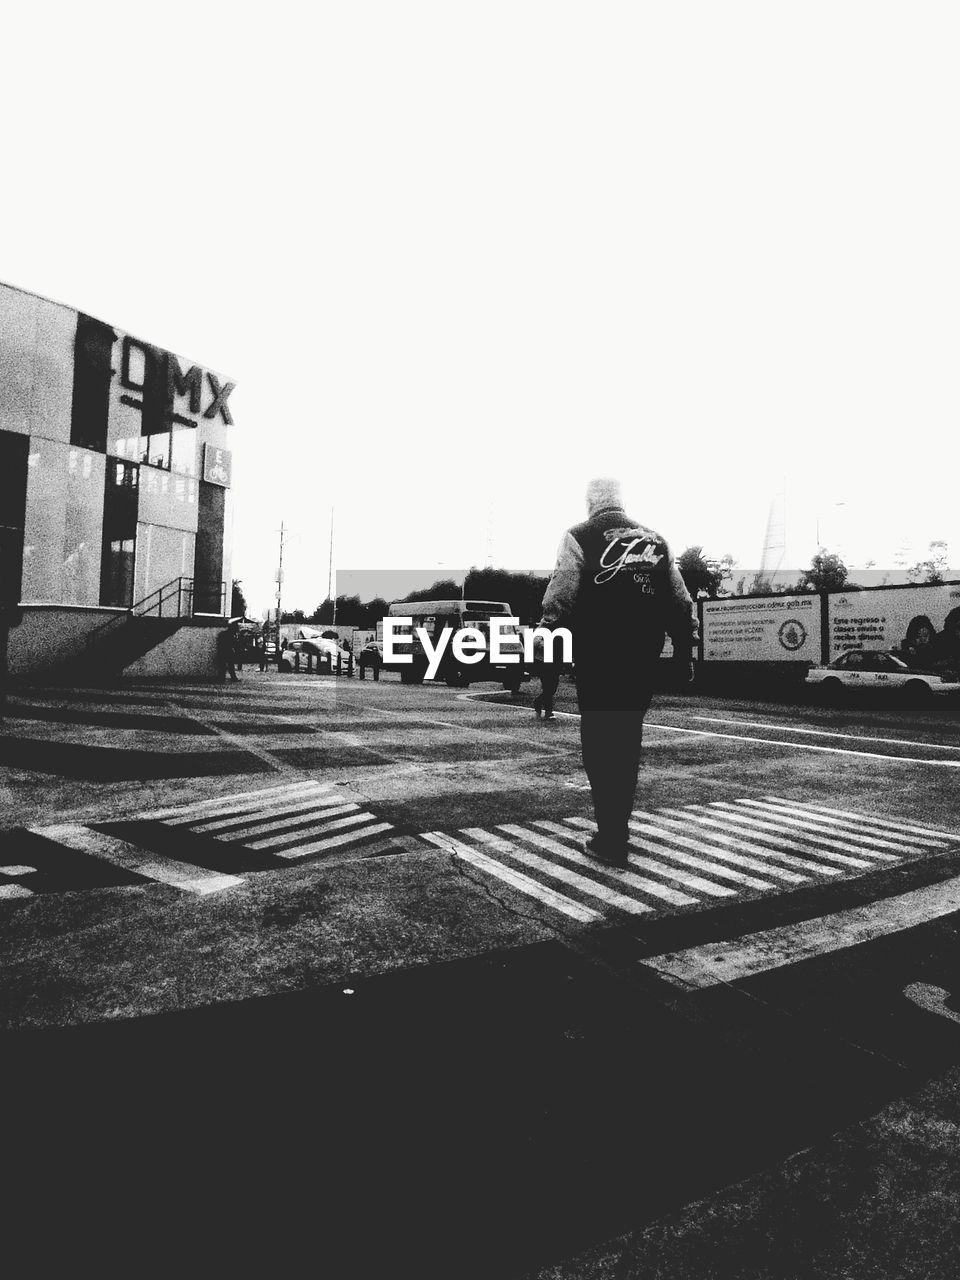 REAR VIEW OF MAN WALKING ON STREET IN CITY AGAINST SKY